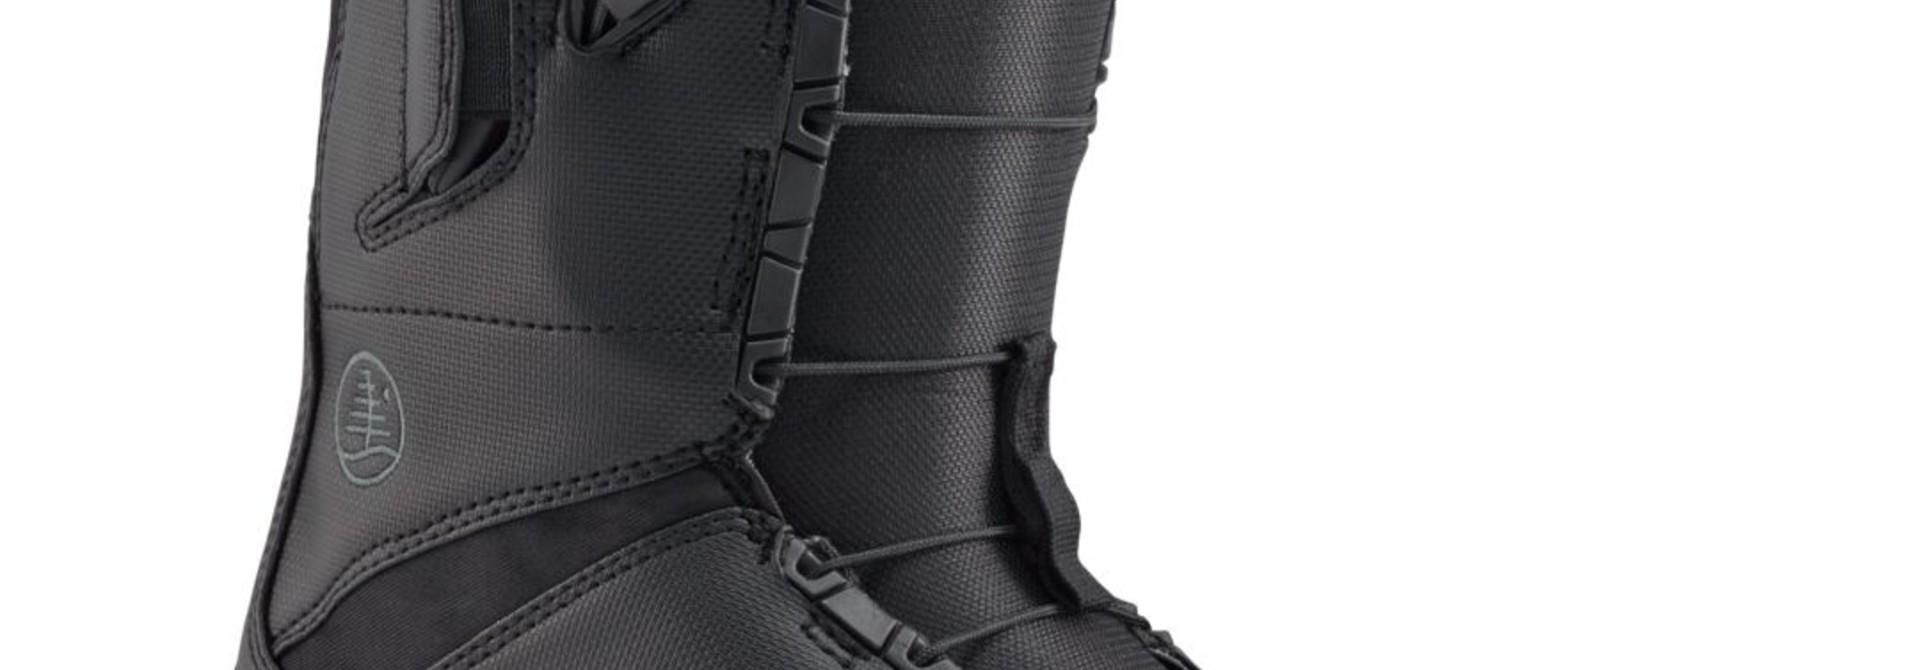 Men's Tourist Boot Black 8